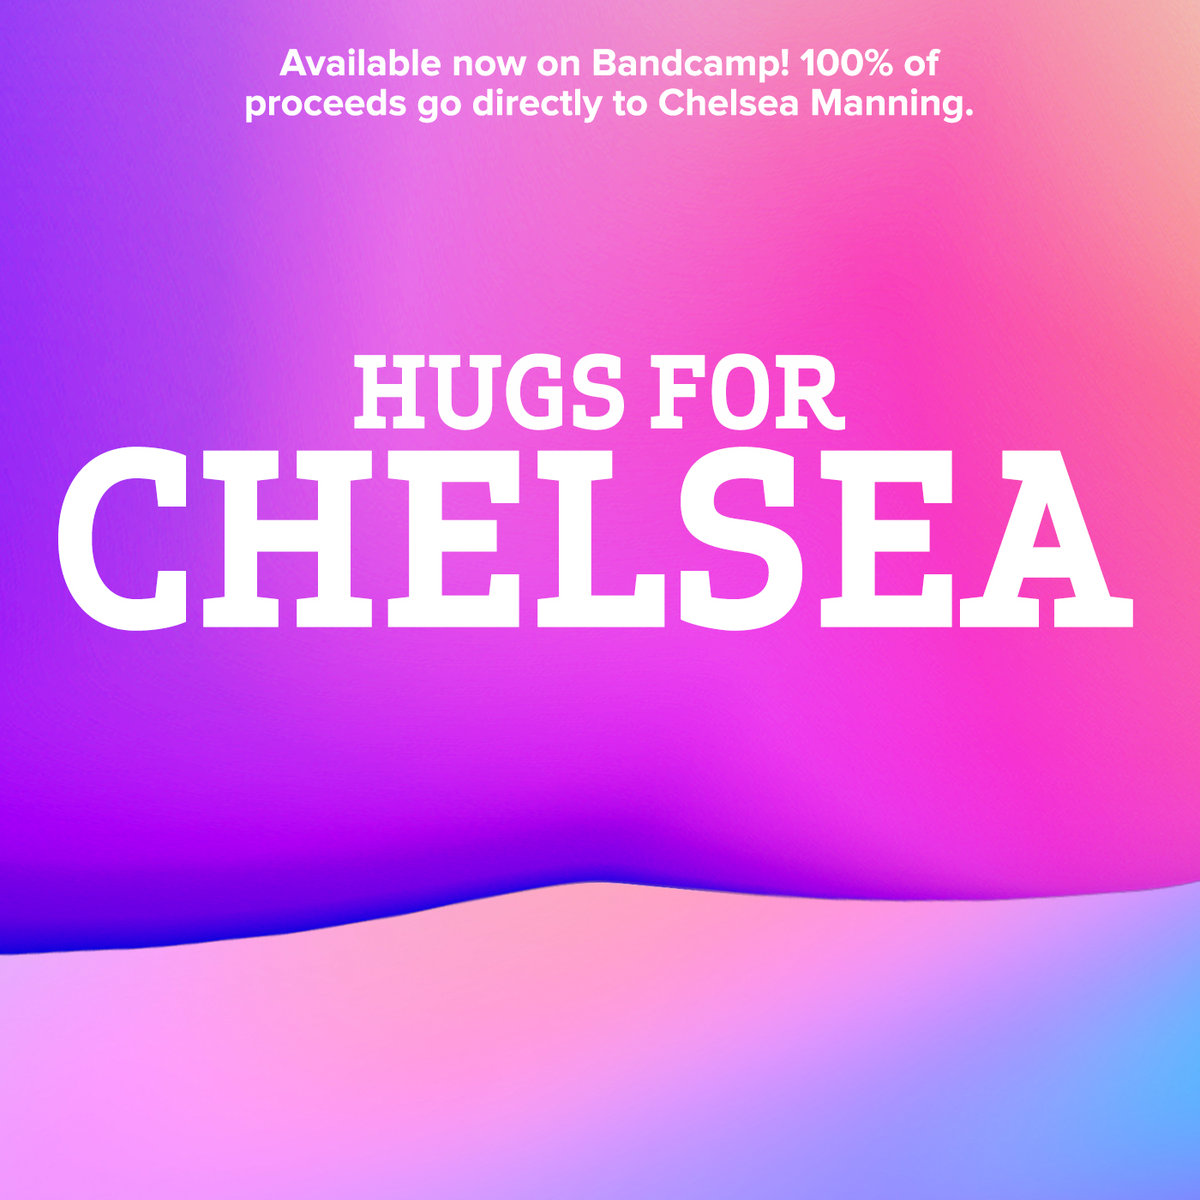 HugsForChelsea